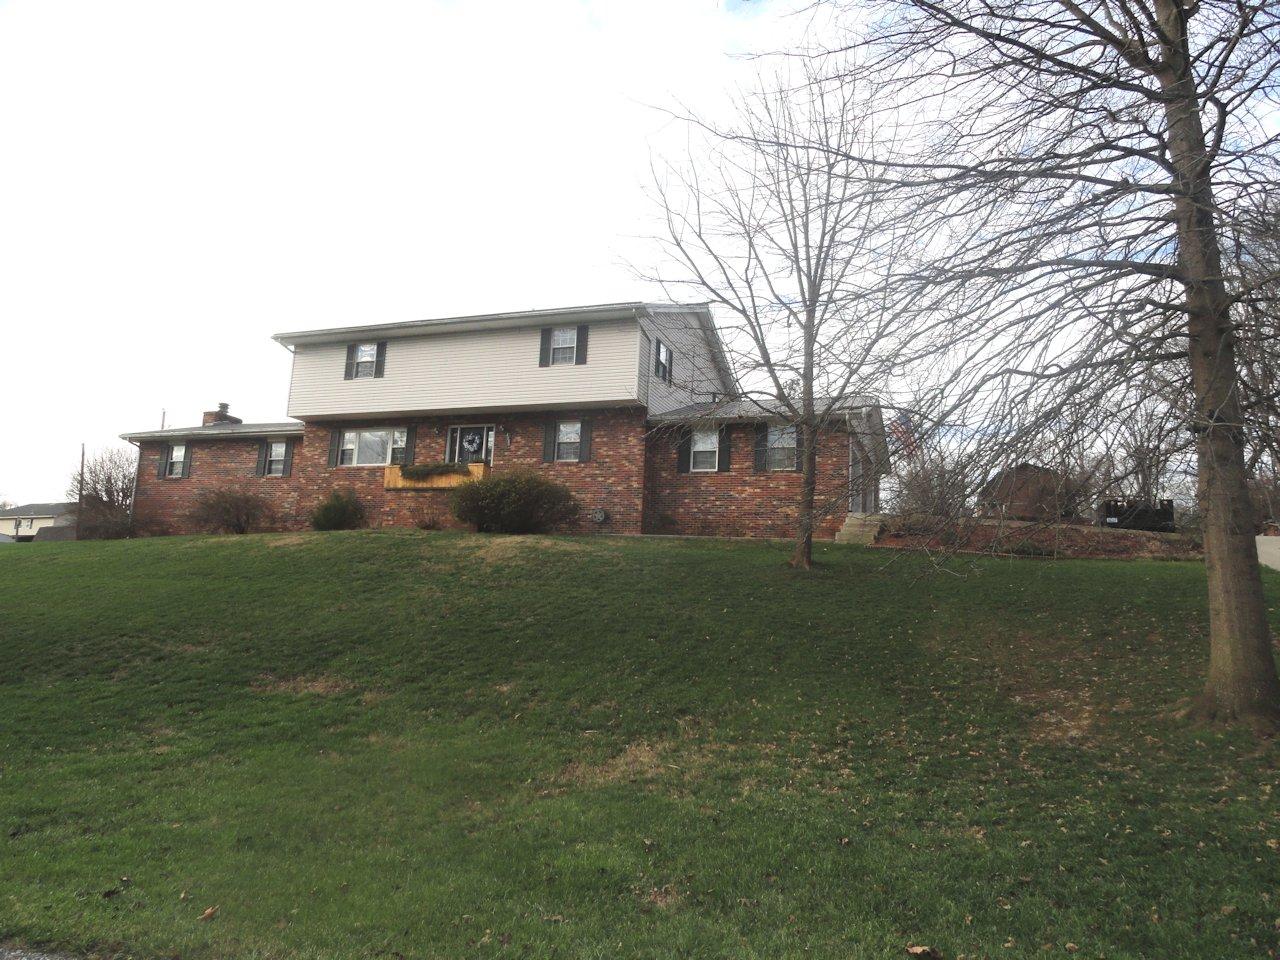 4035 Willow Drive, Ashland, Kentucky 41102